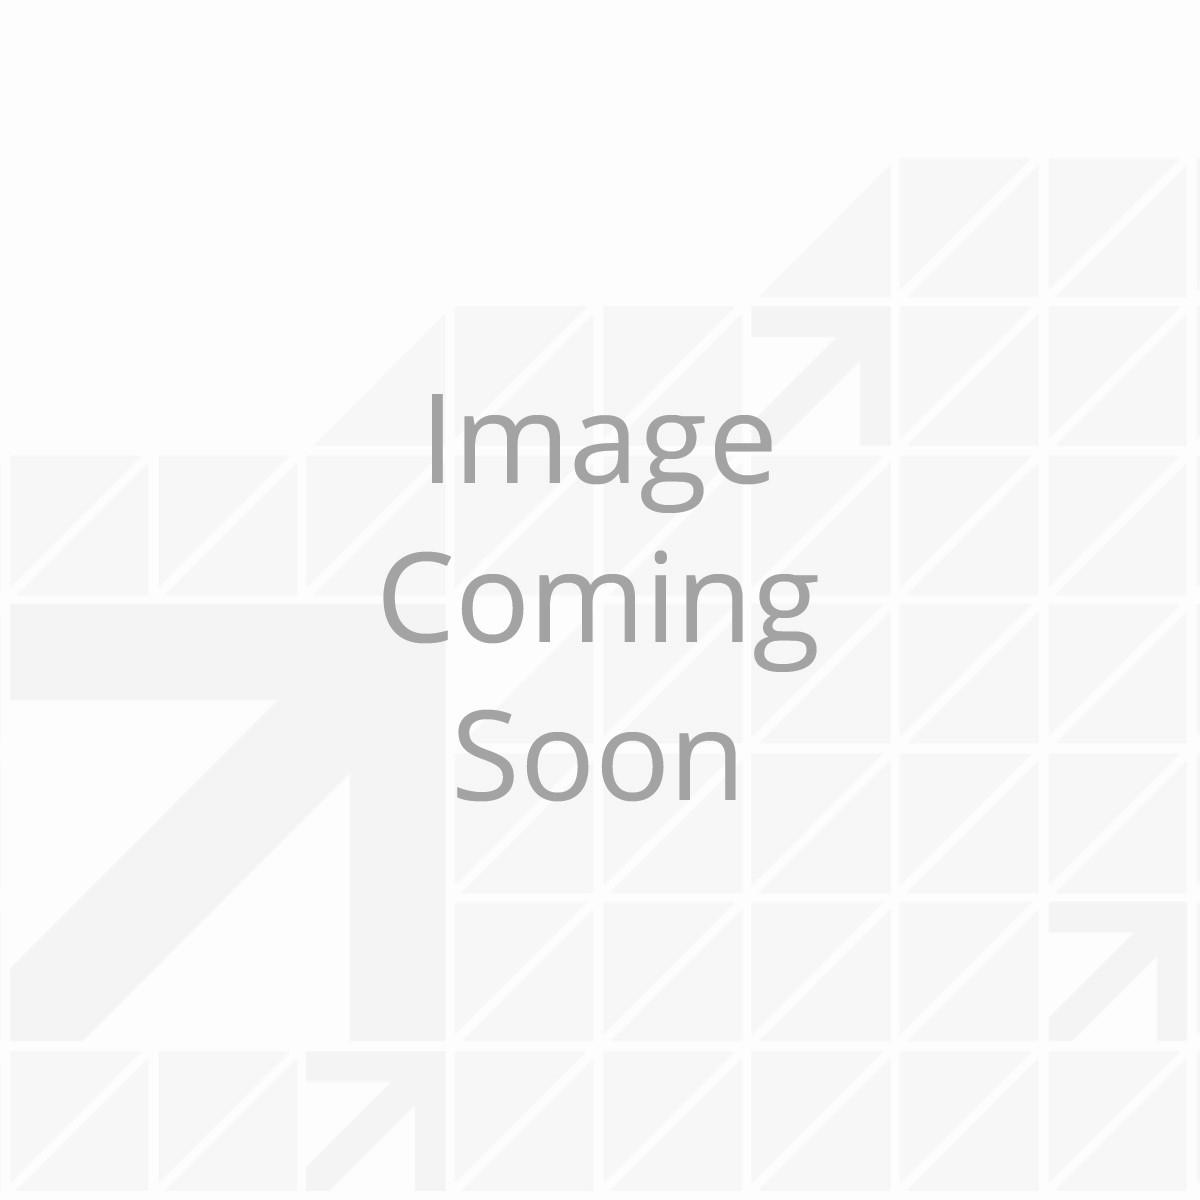 Awning J-Rail; 8' - White (5 Pk Bundle)